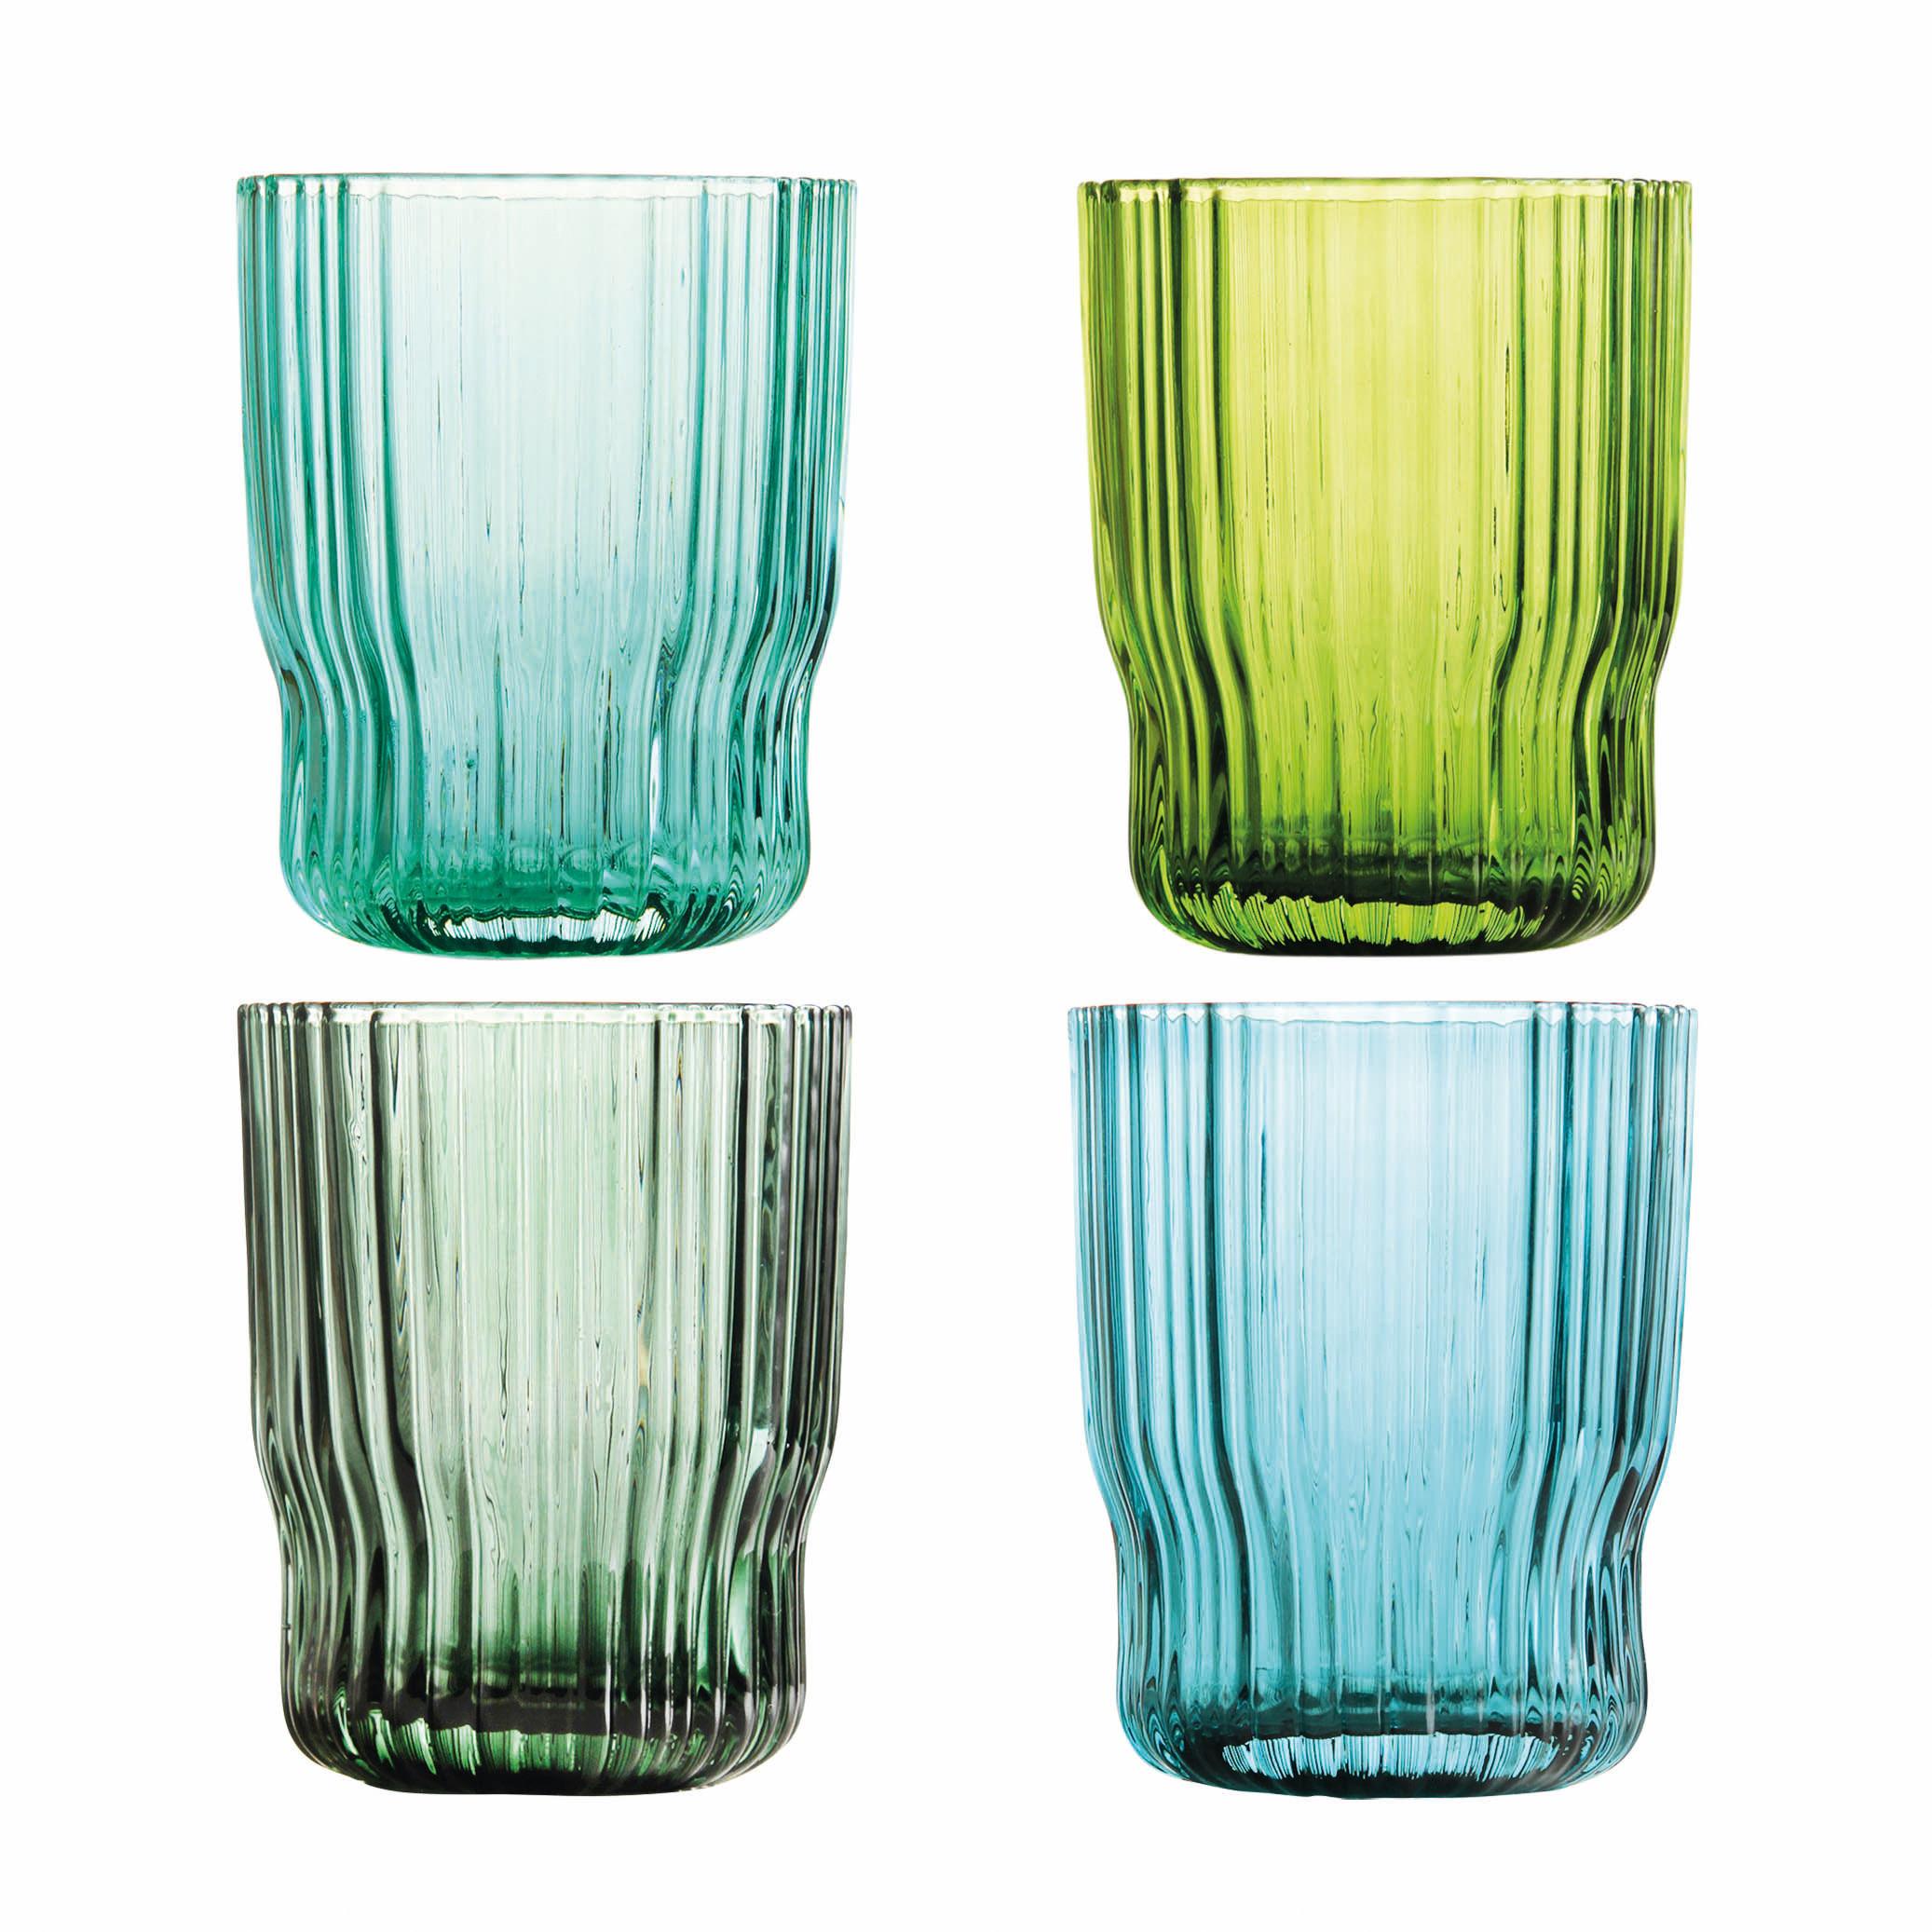 Tavola - Bicchieri  - Bicchiere Riffle - / Set di 4 di & klevering - Multicolore - Verre texturé